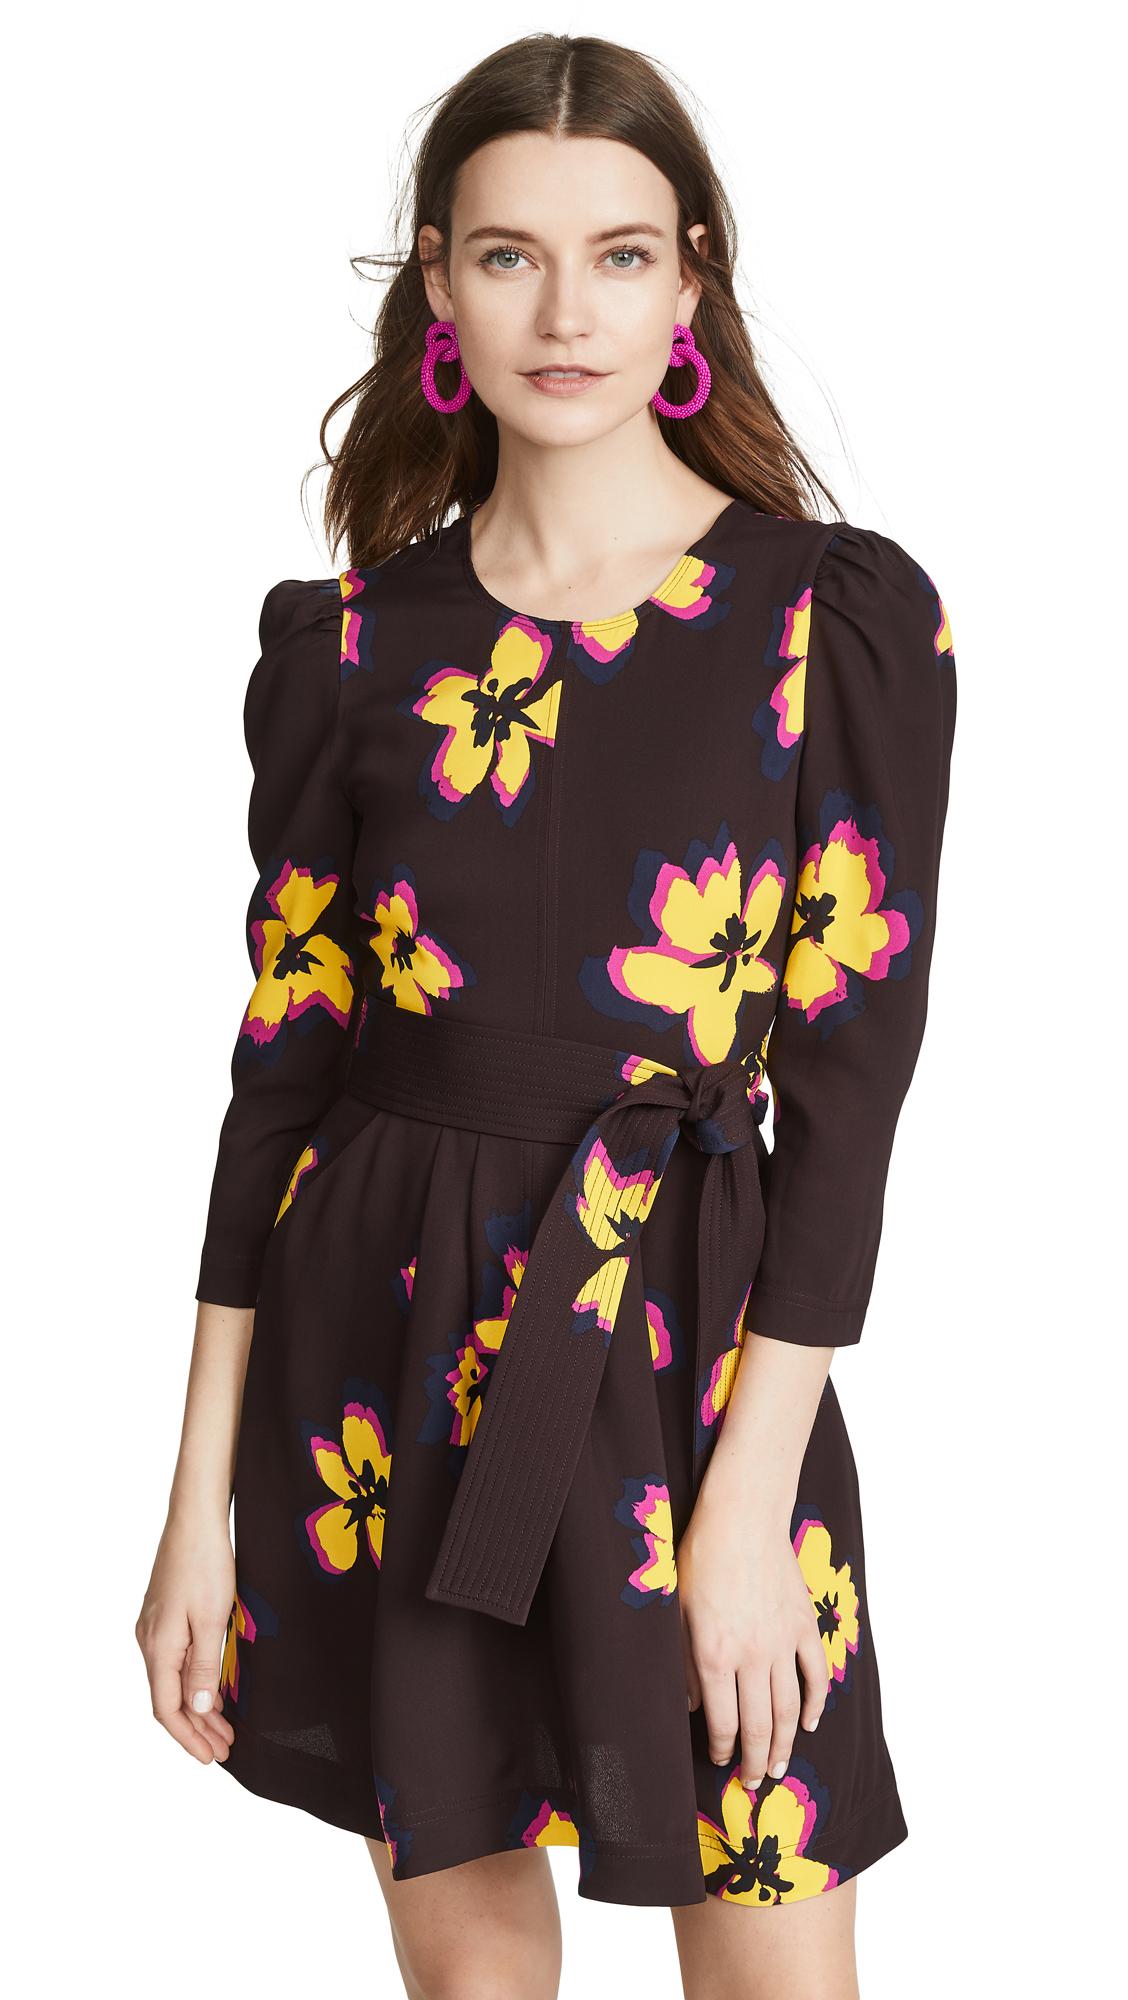 A.L.C. Stella Dress - Chocolate/Yellow Flower